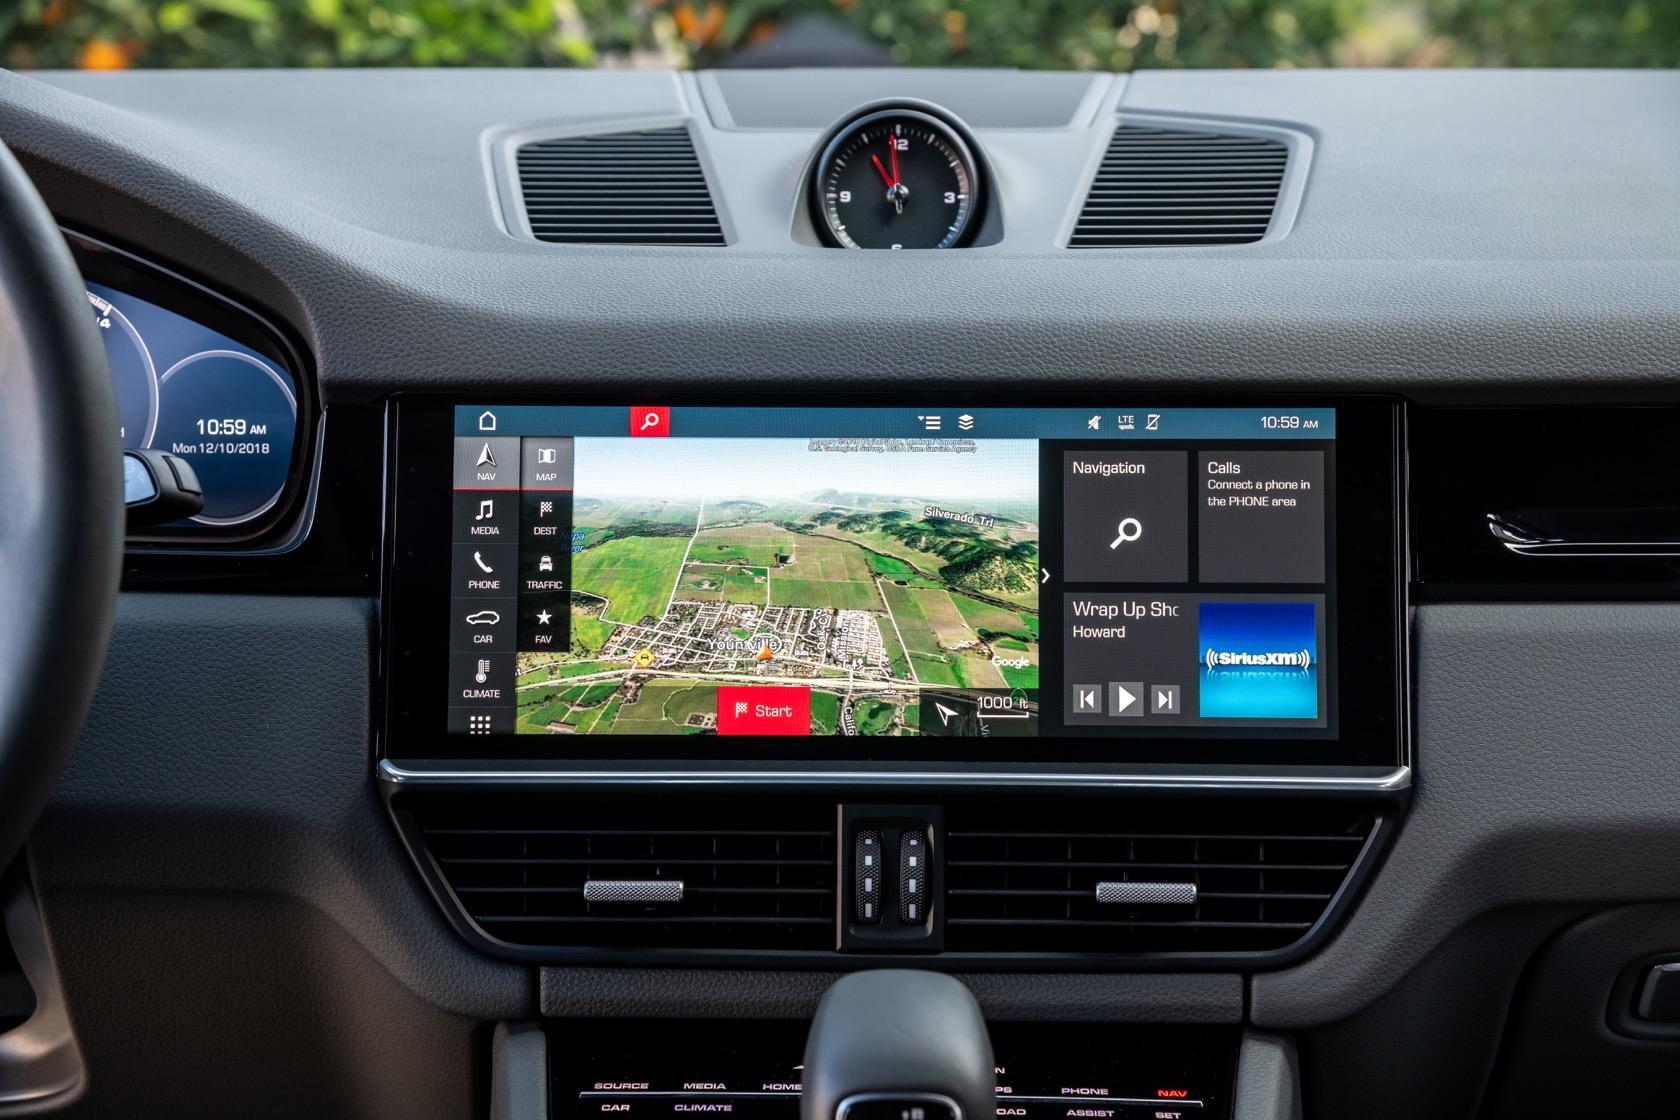 2019 Porsche Cayenne First Drive Review: My perfect spec